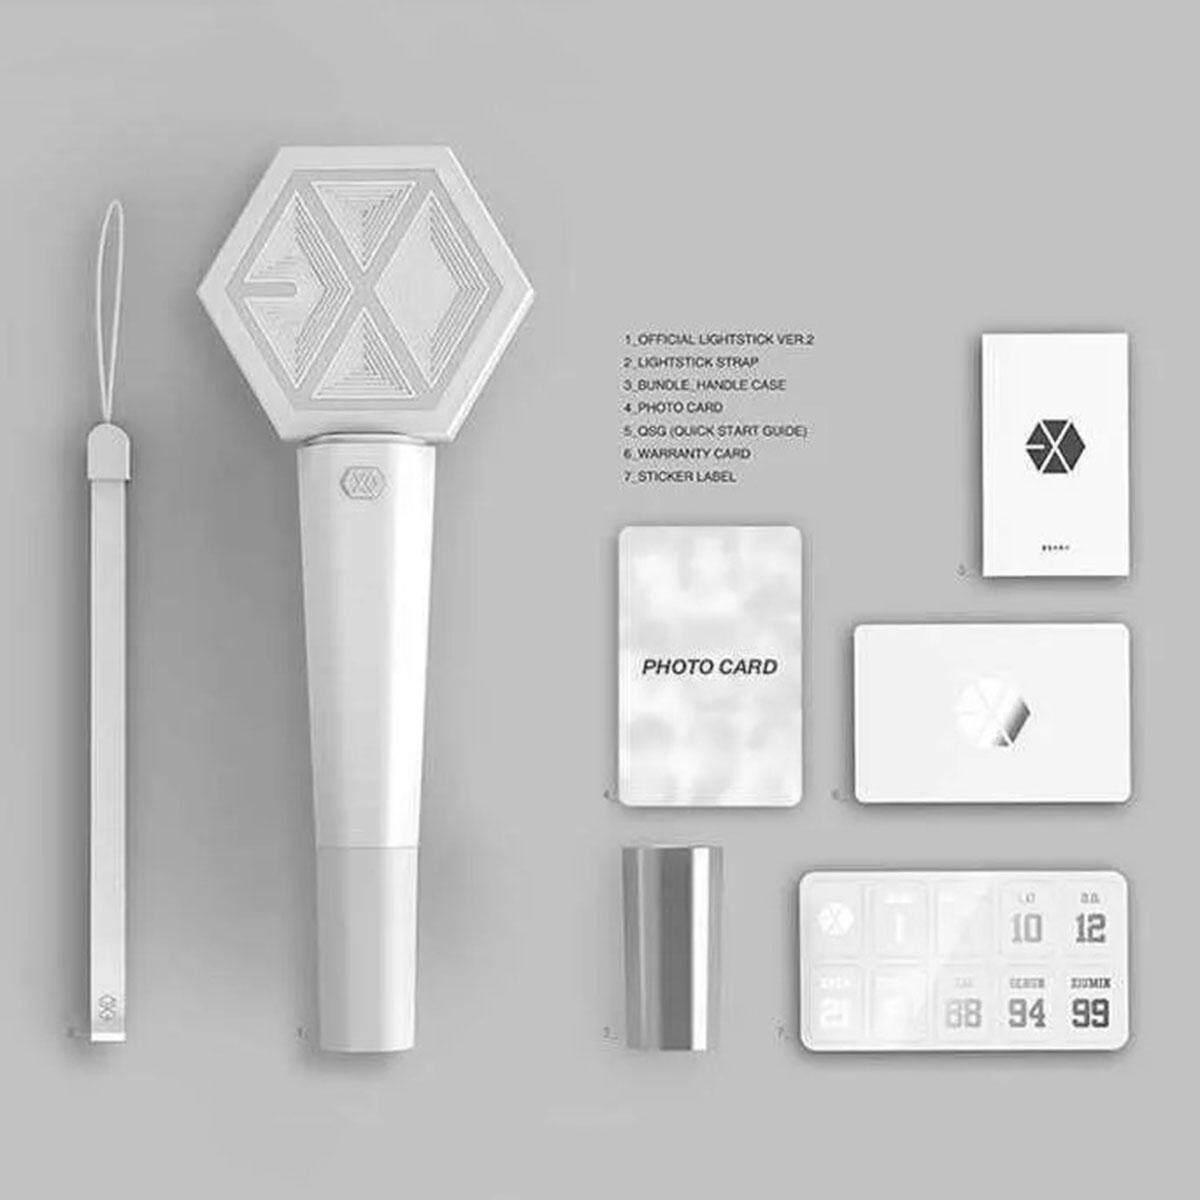 Kpop EXO Sehun Chanyeol Lay White Concert Light stick glow stick - intl